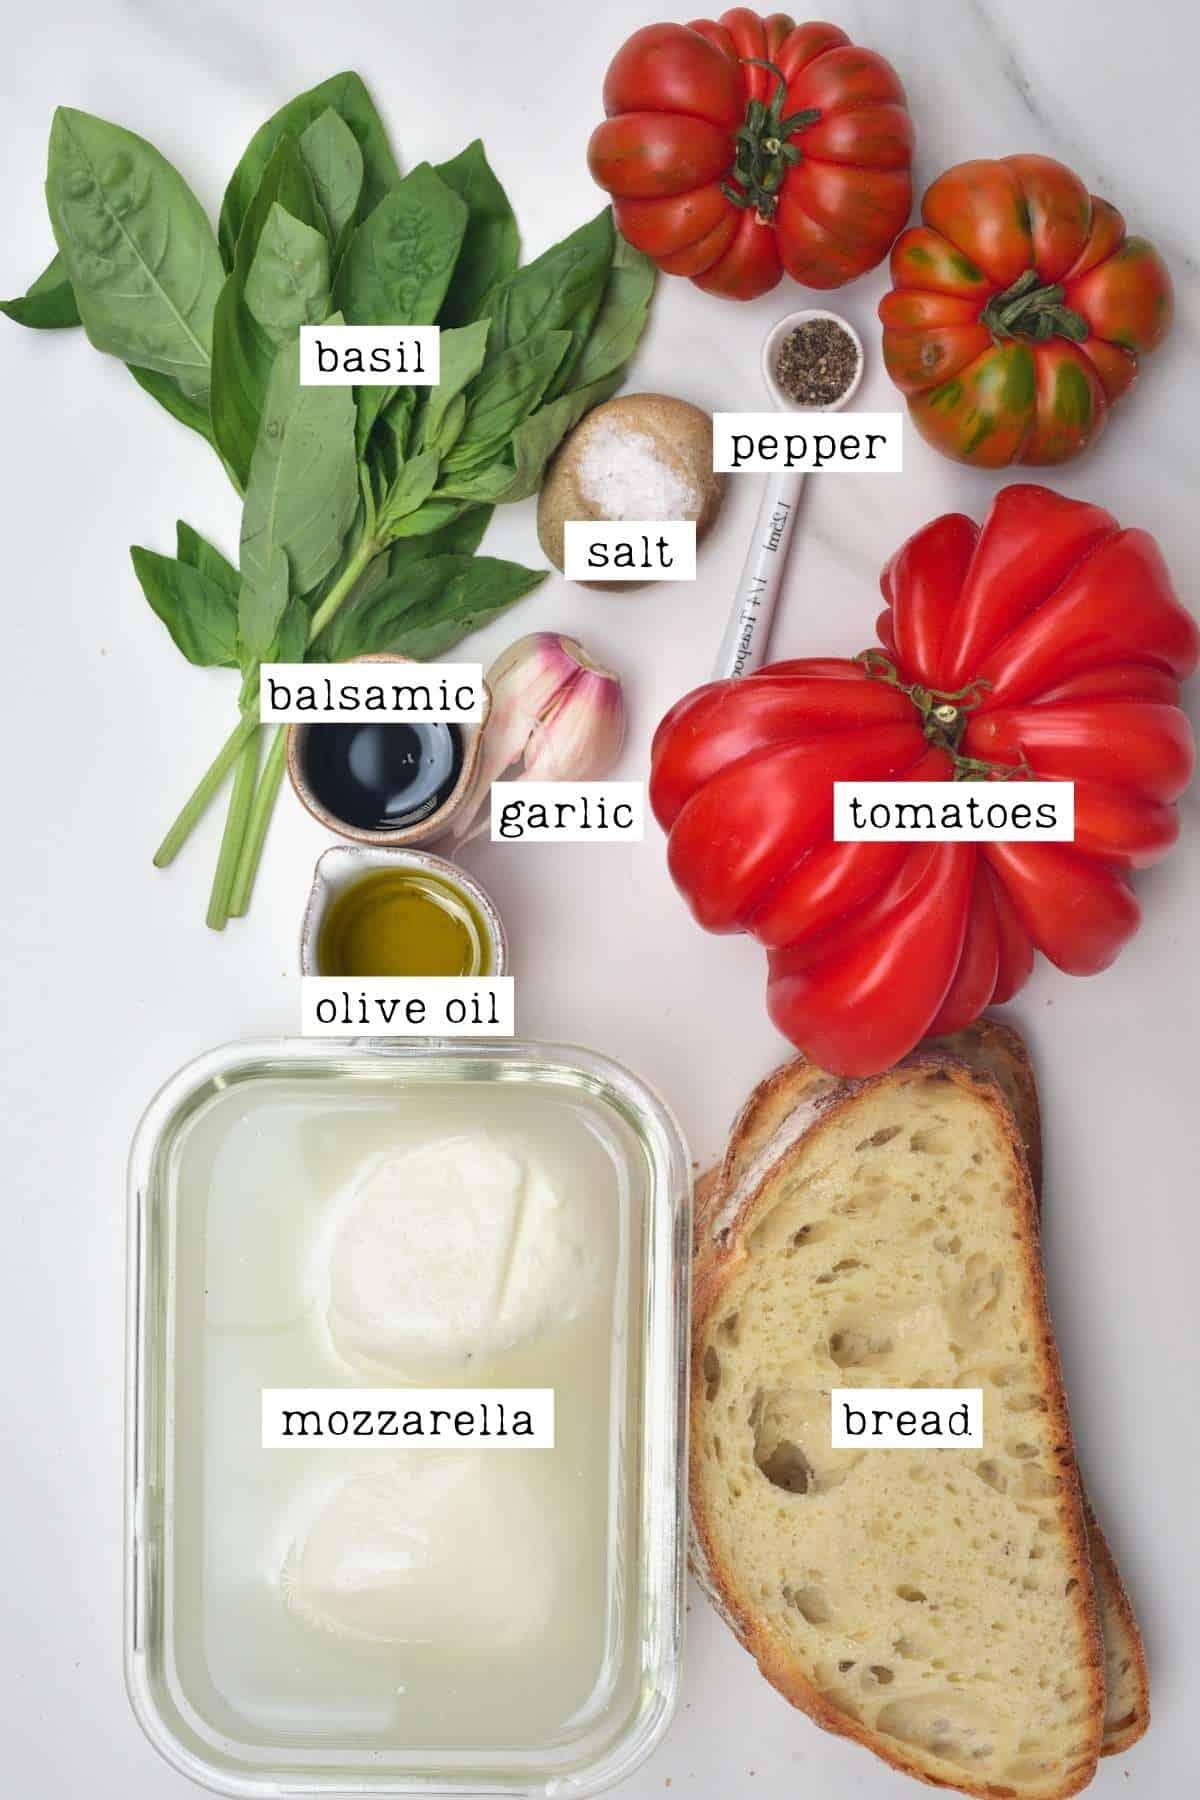 Ingredients for mozzarella tomato bruschetta